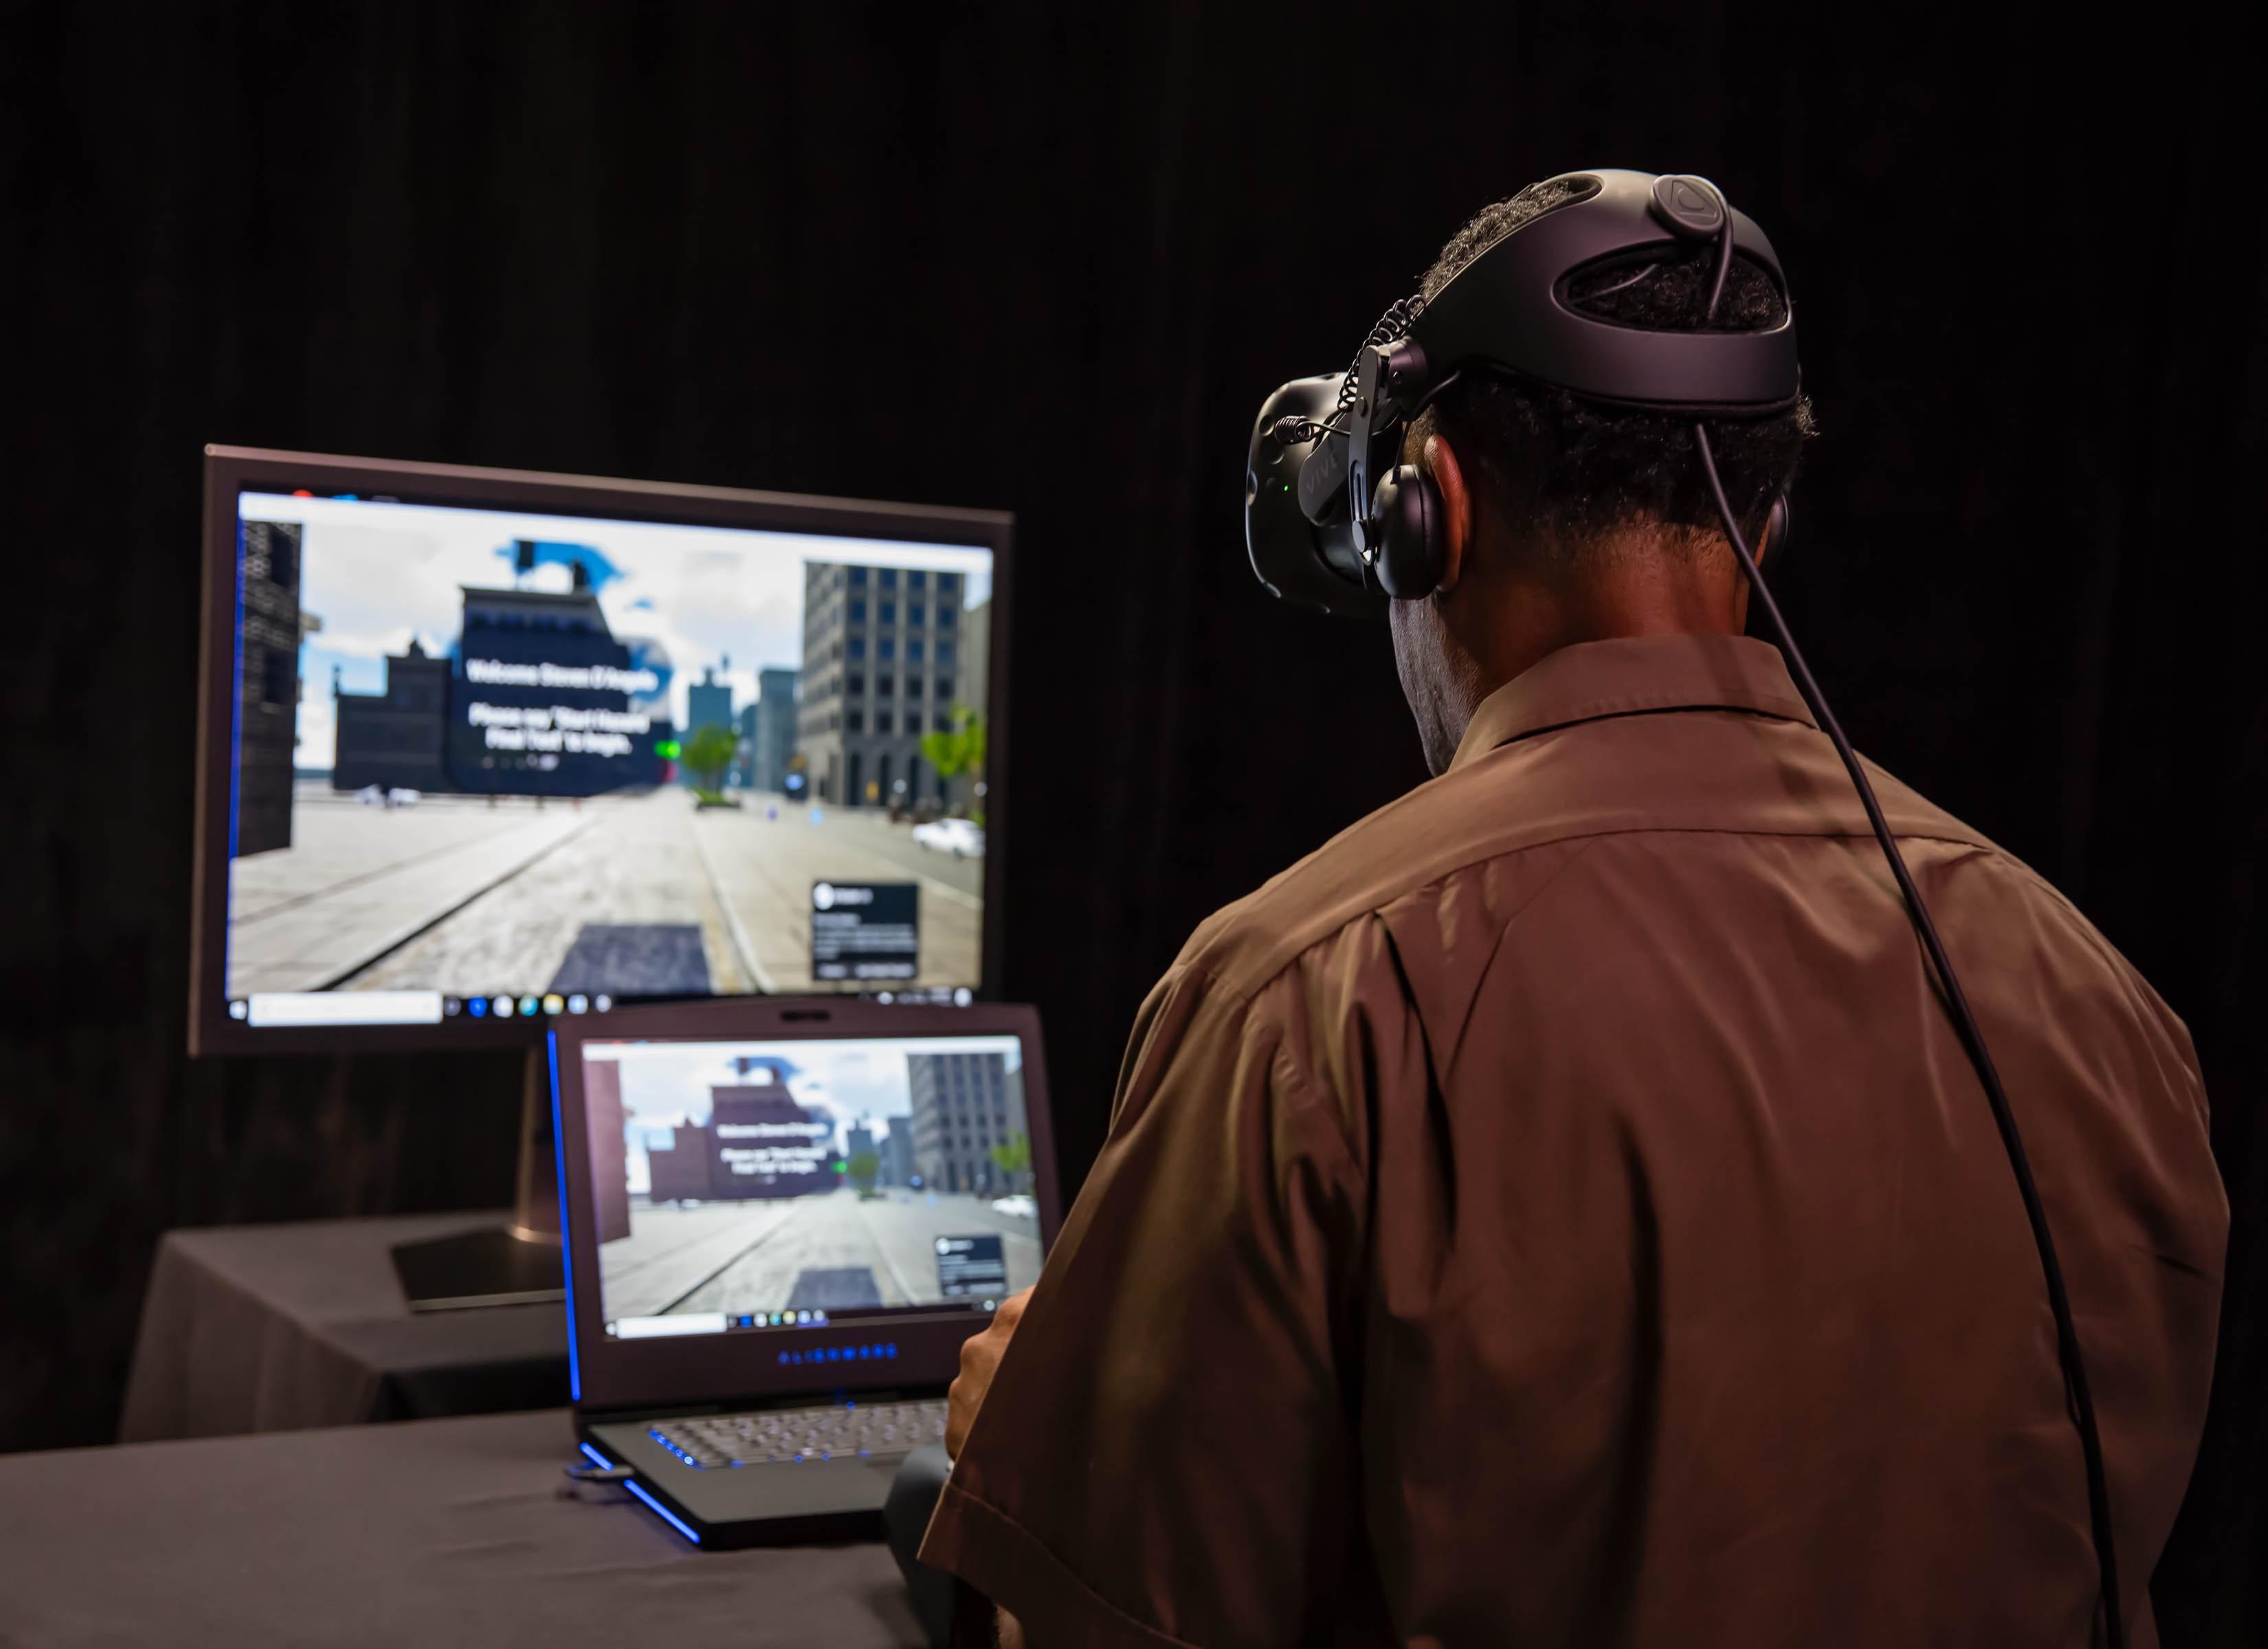 UPS Turns to Virtual Reality to Train Drivers